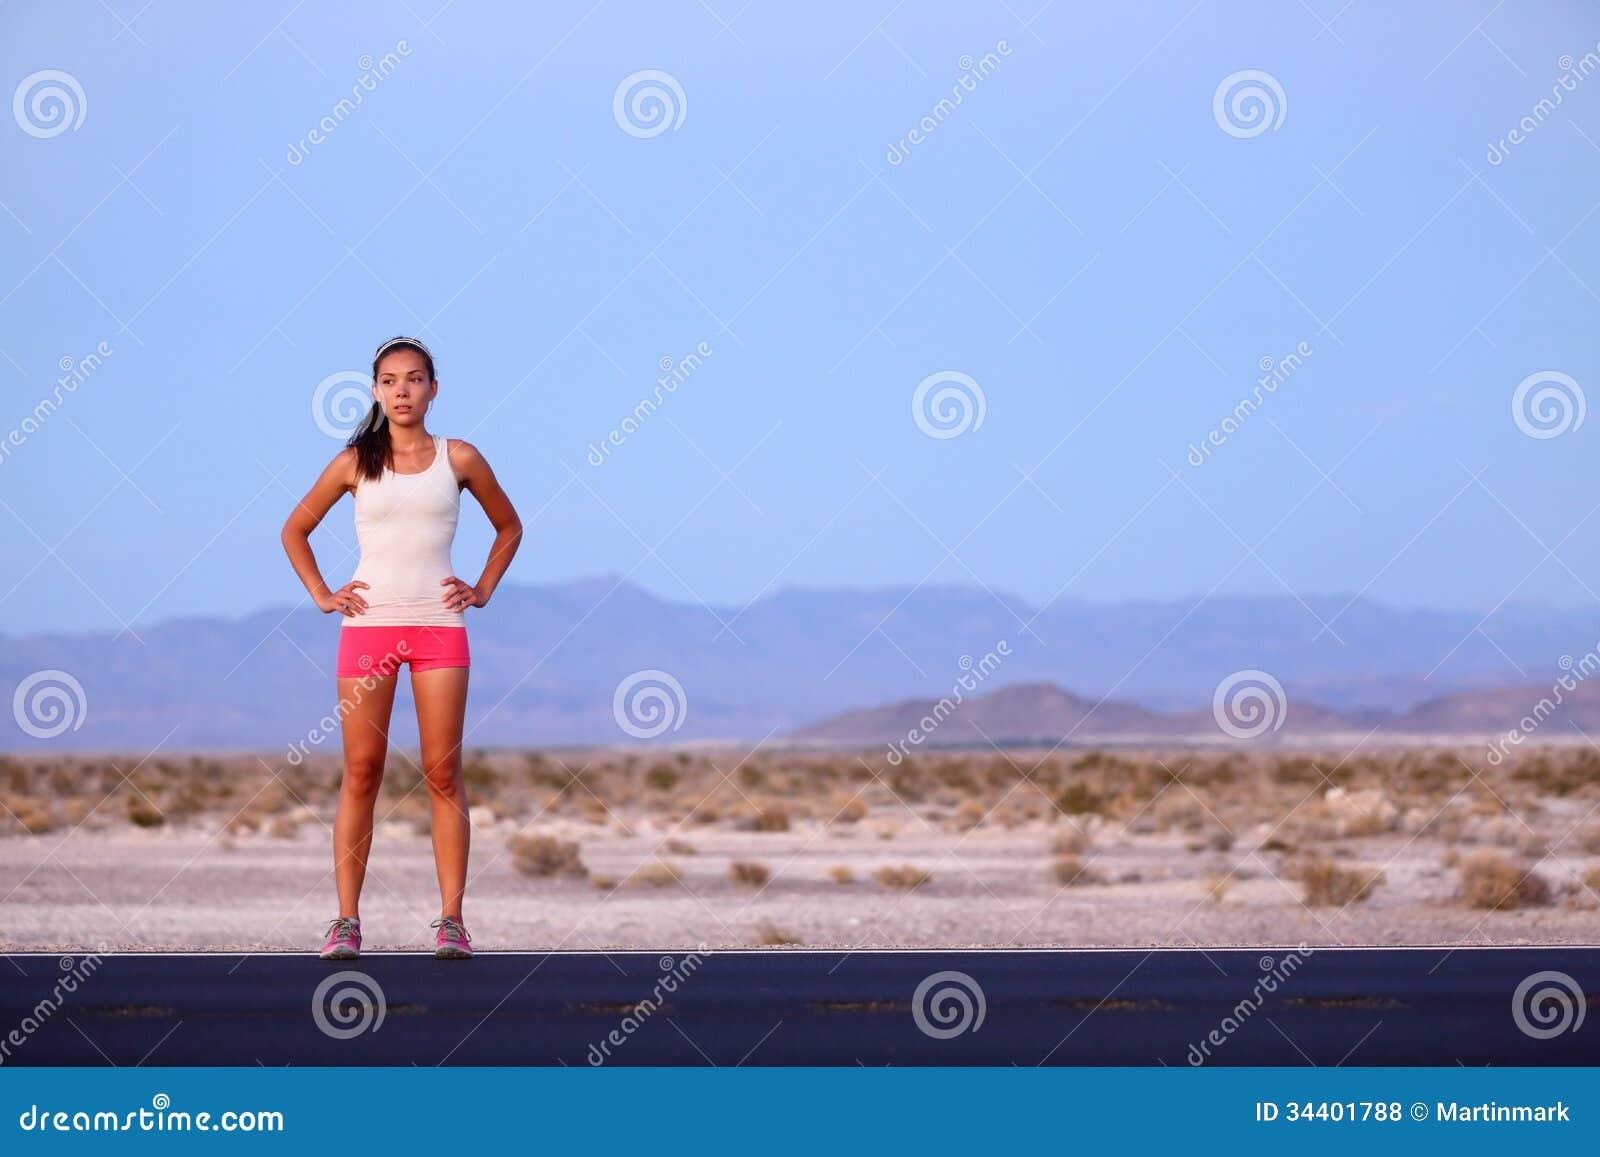 Mulher do corredor do atleta que descansa na estrada após a corrida